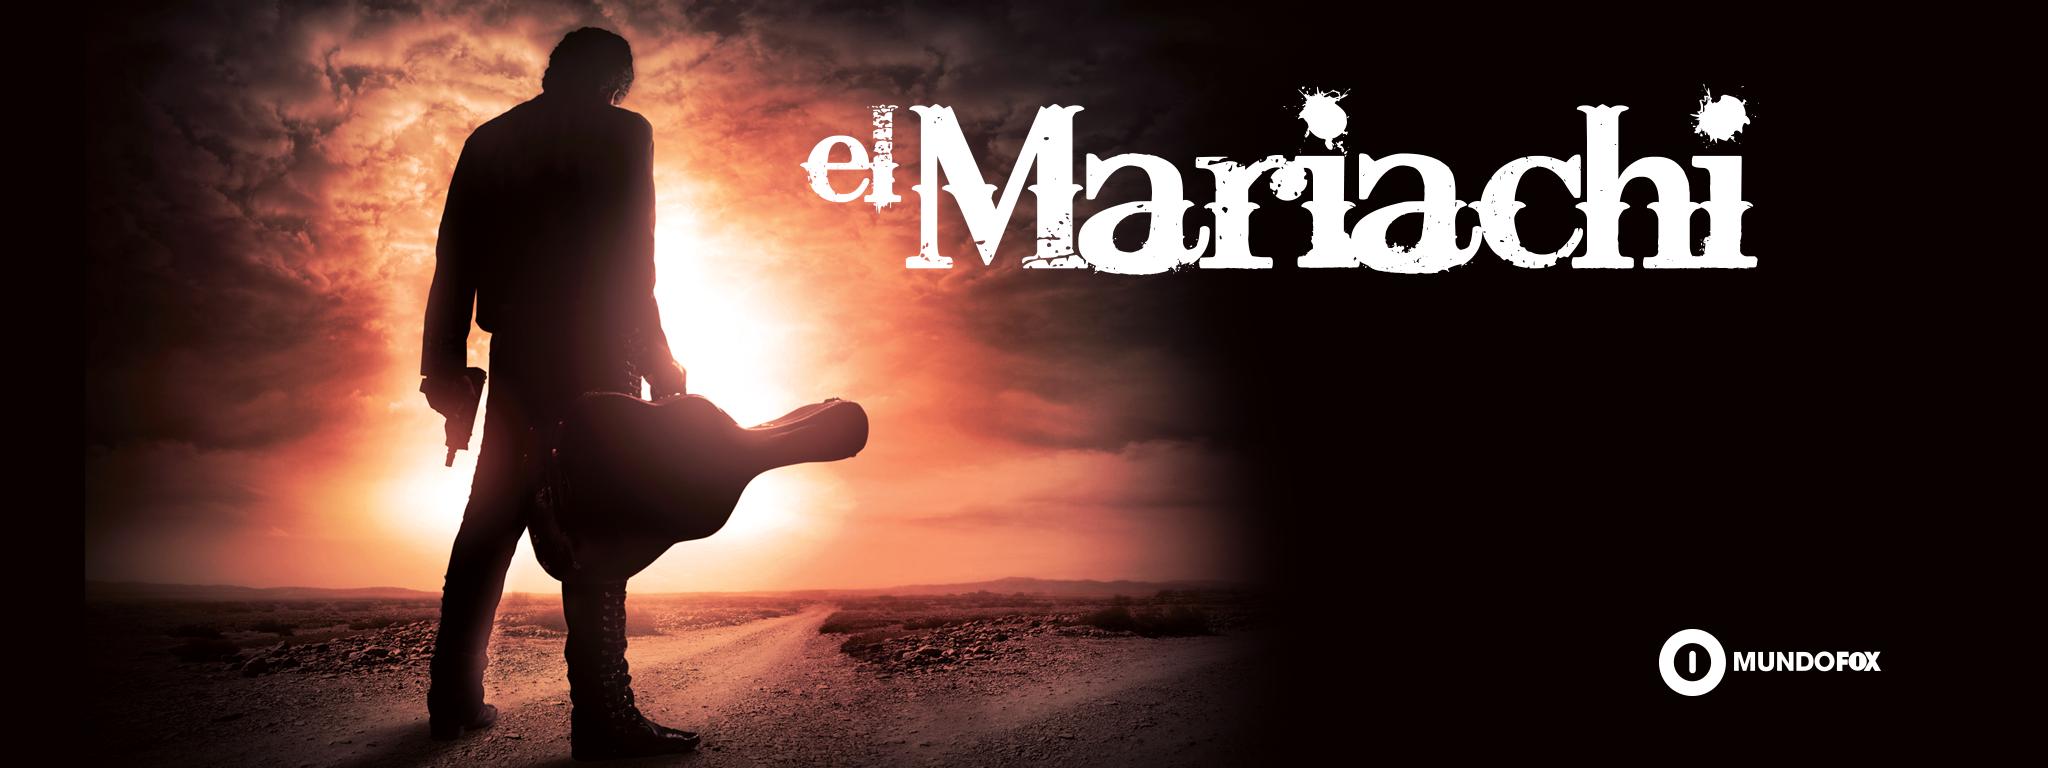 El_Mariachi